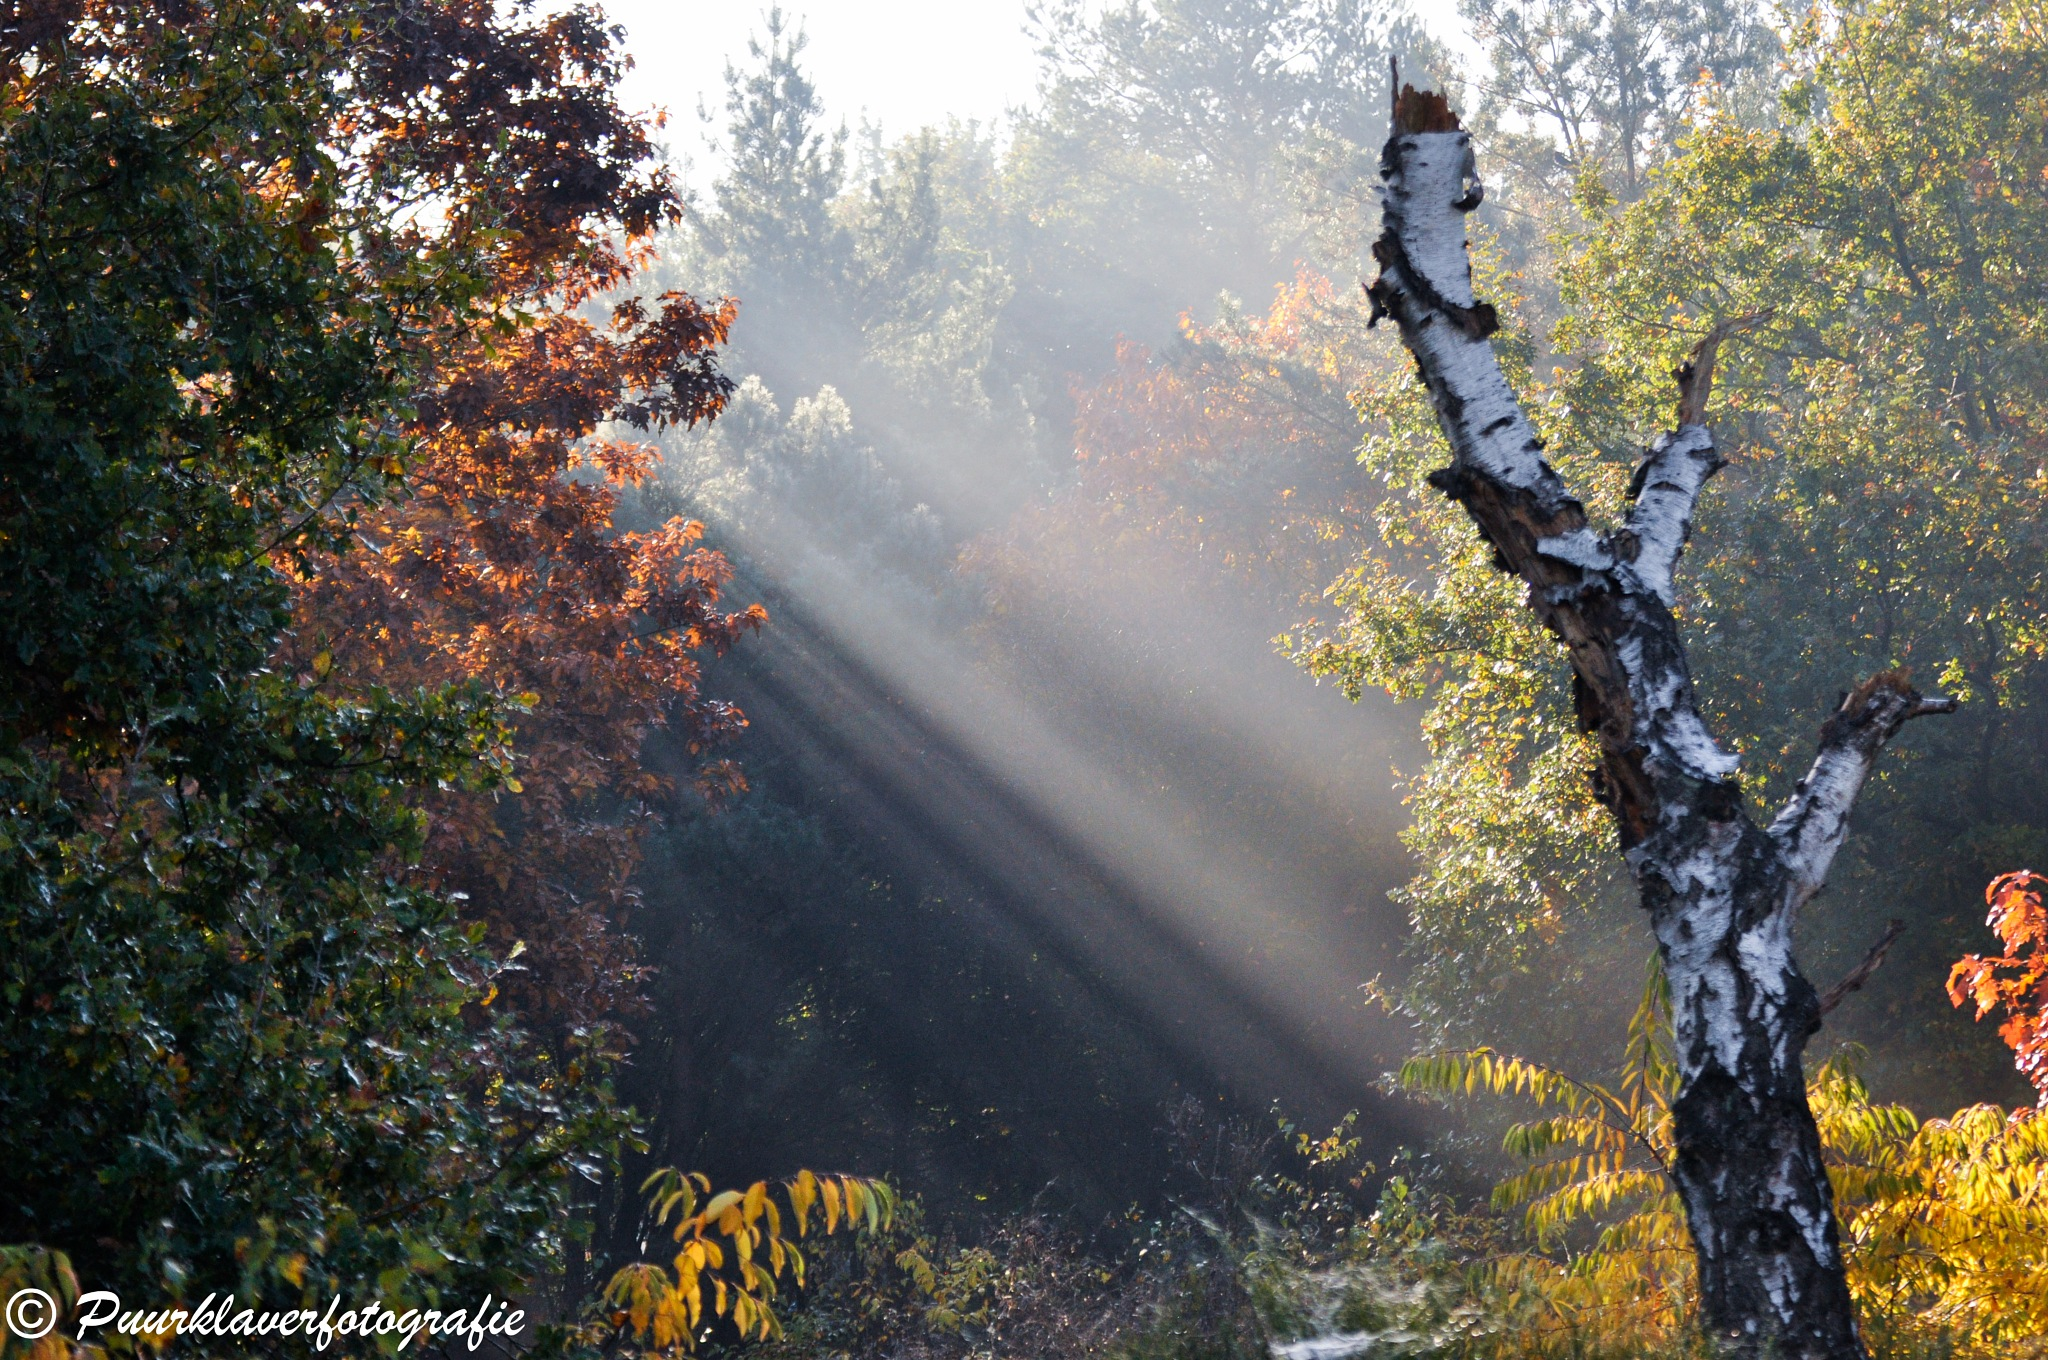 Magic in nature by Puurklaver